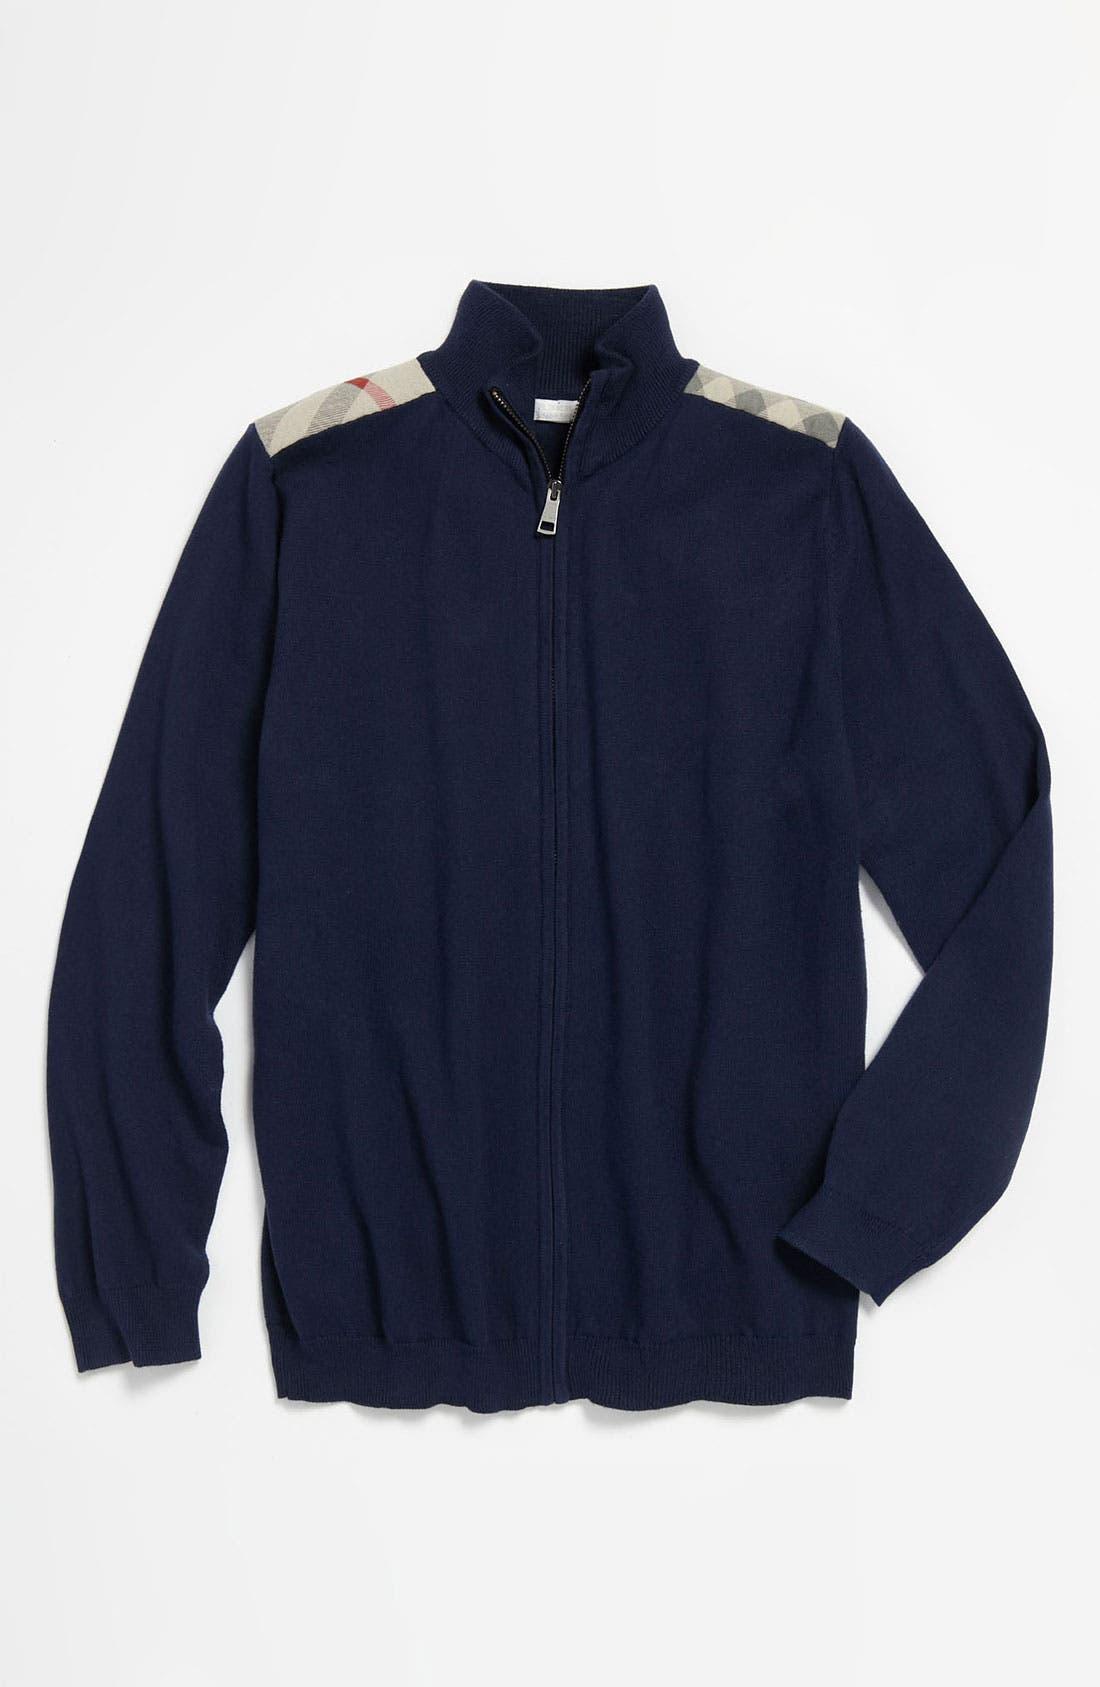 Alternate Image 1 Selected - Burberry High Neck Sweater (Little Boys & Big Boys)